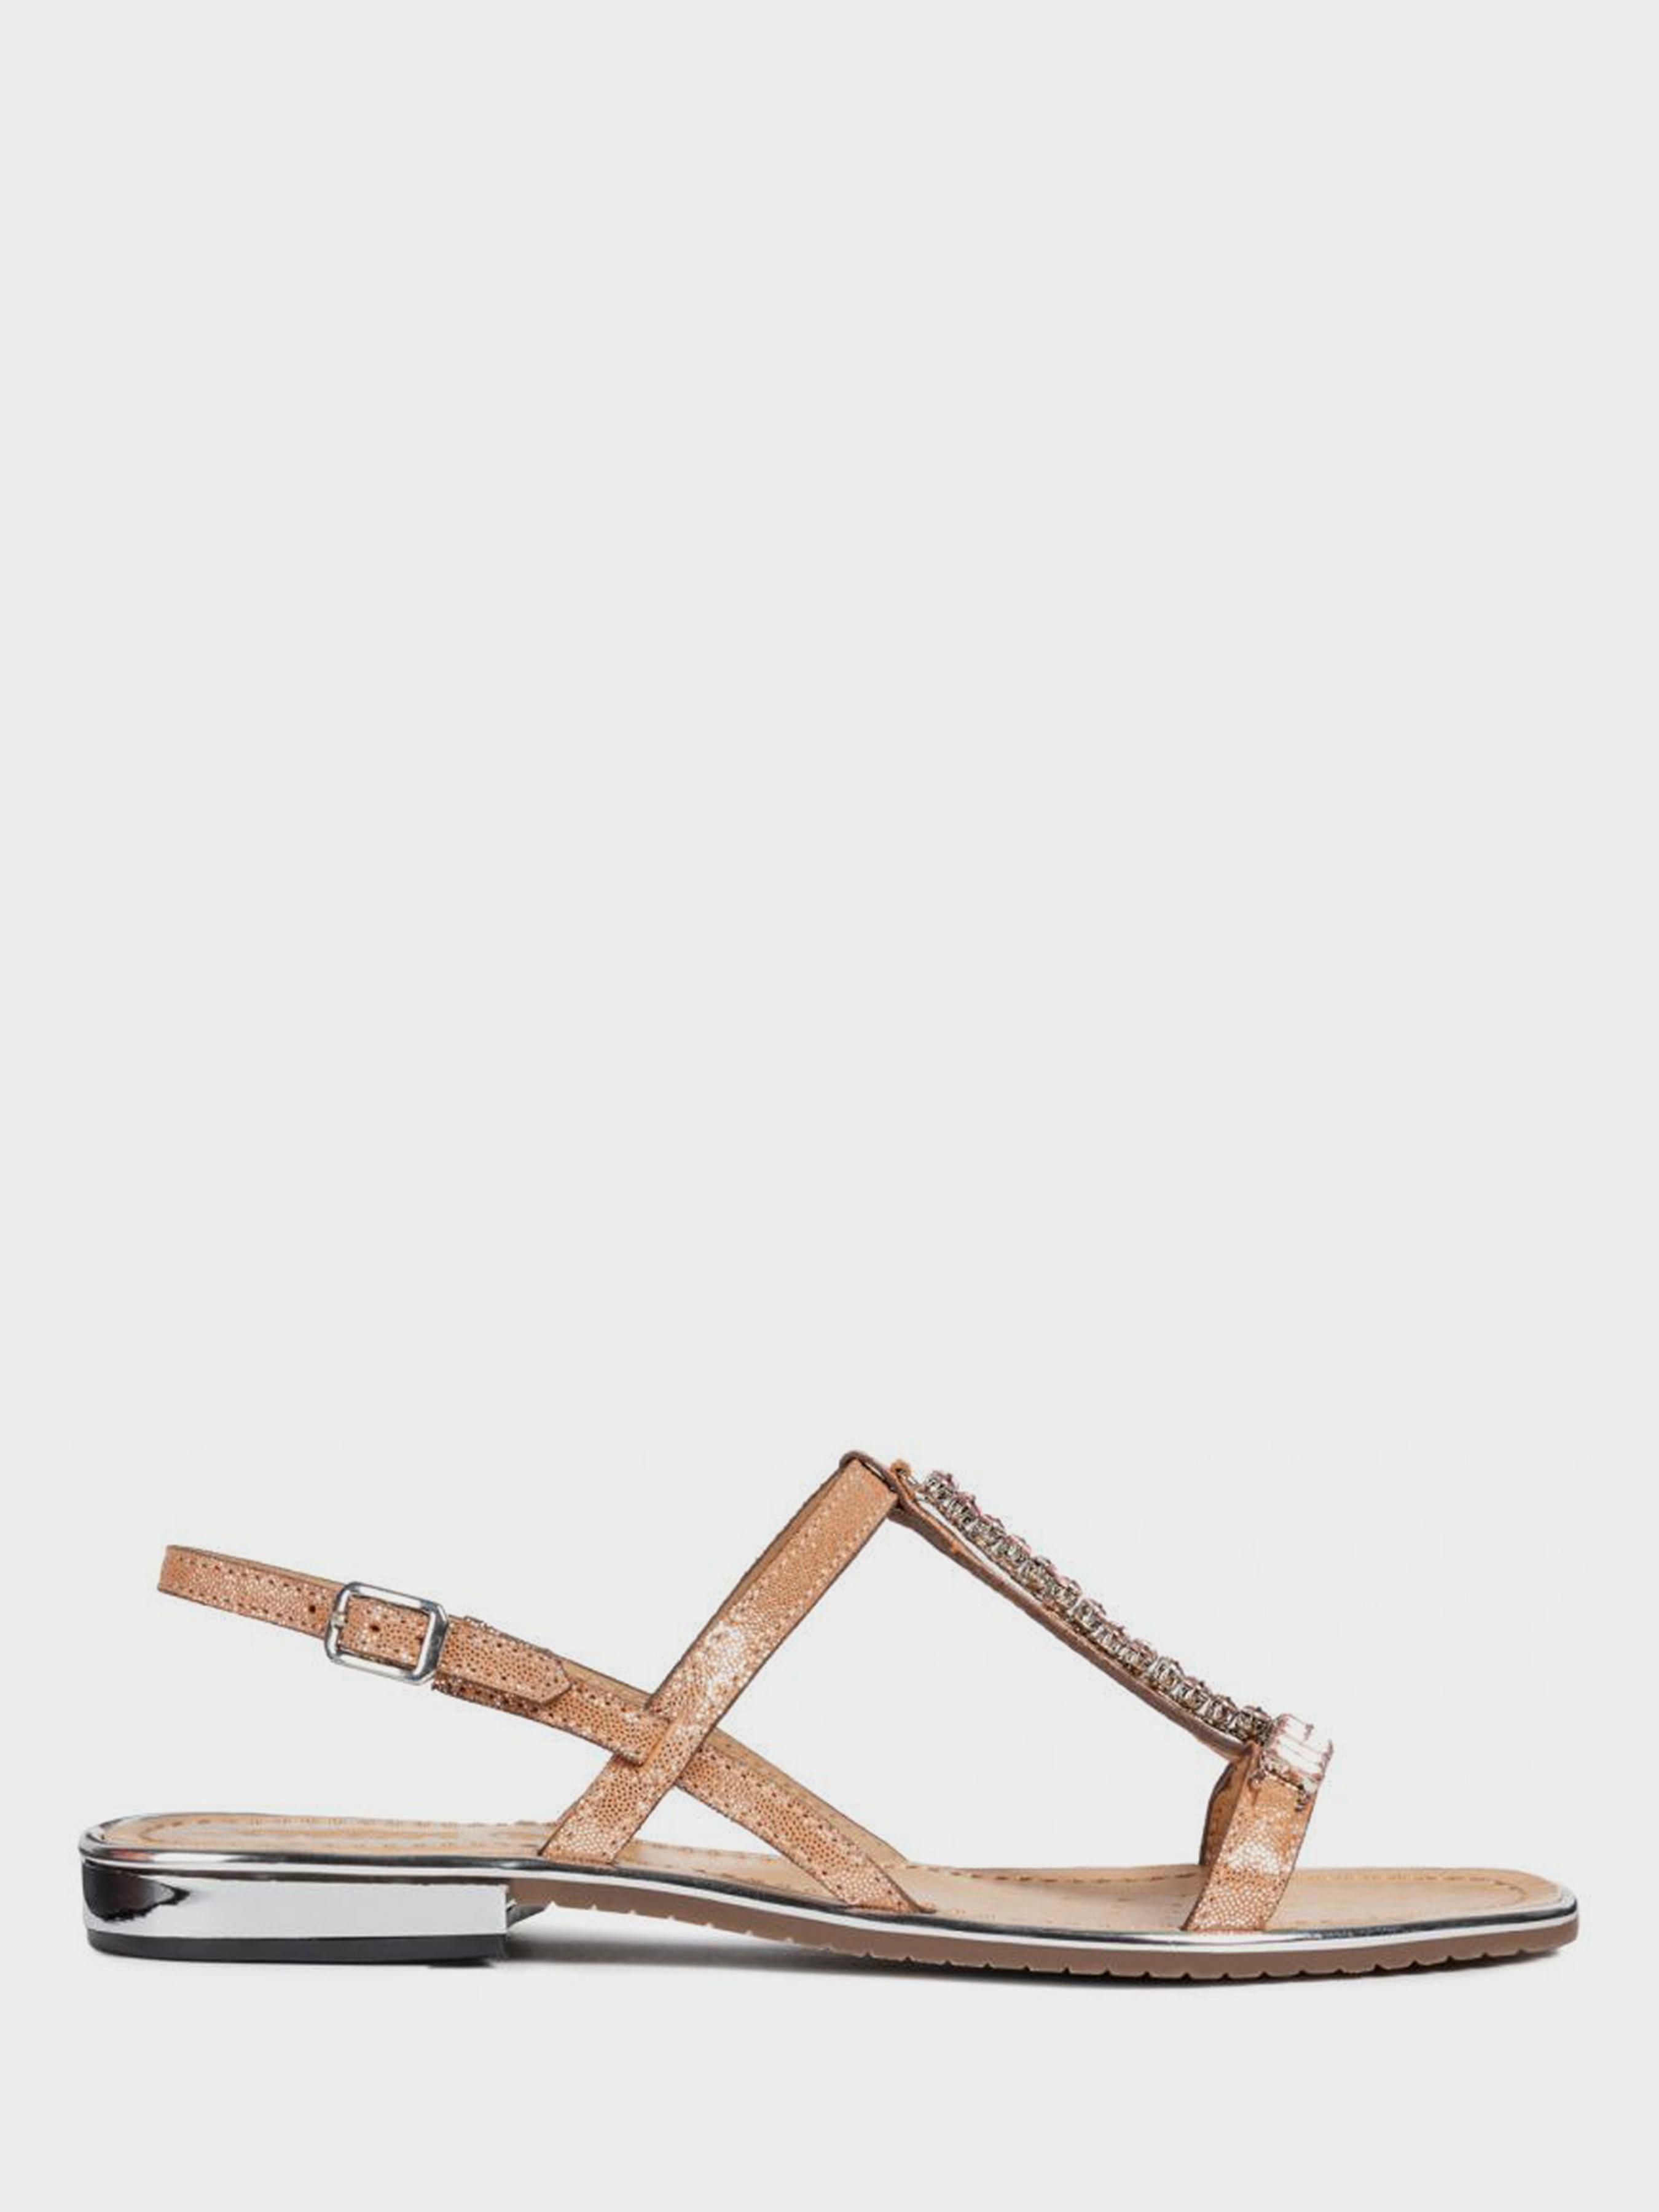 Сандалии женские Geox D SOZY PLUS XW3593 купить обувь, 2017